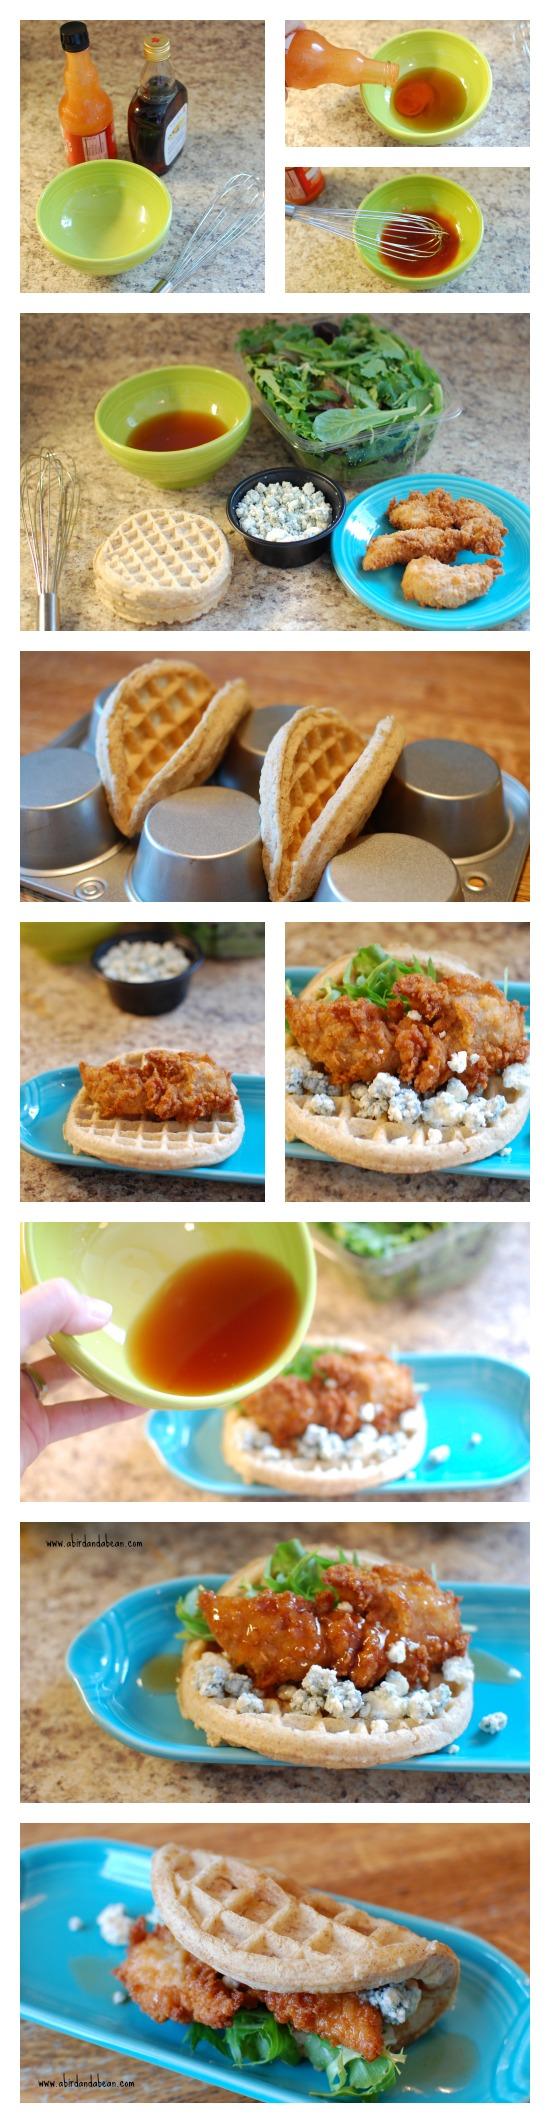 chickennwaffles.jpg